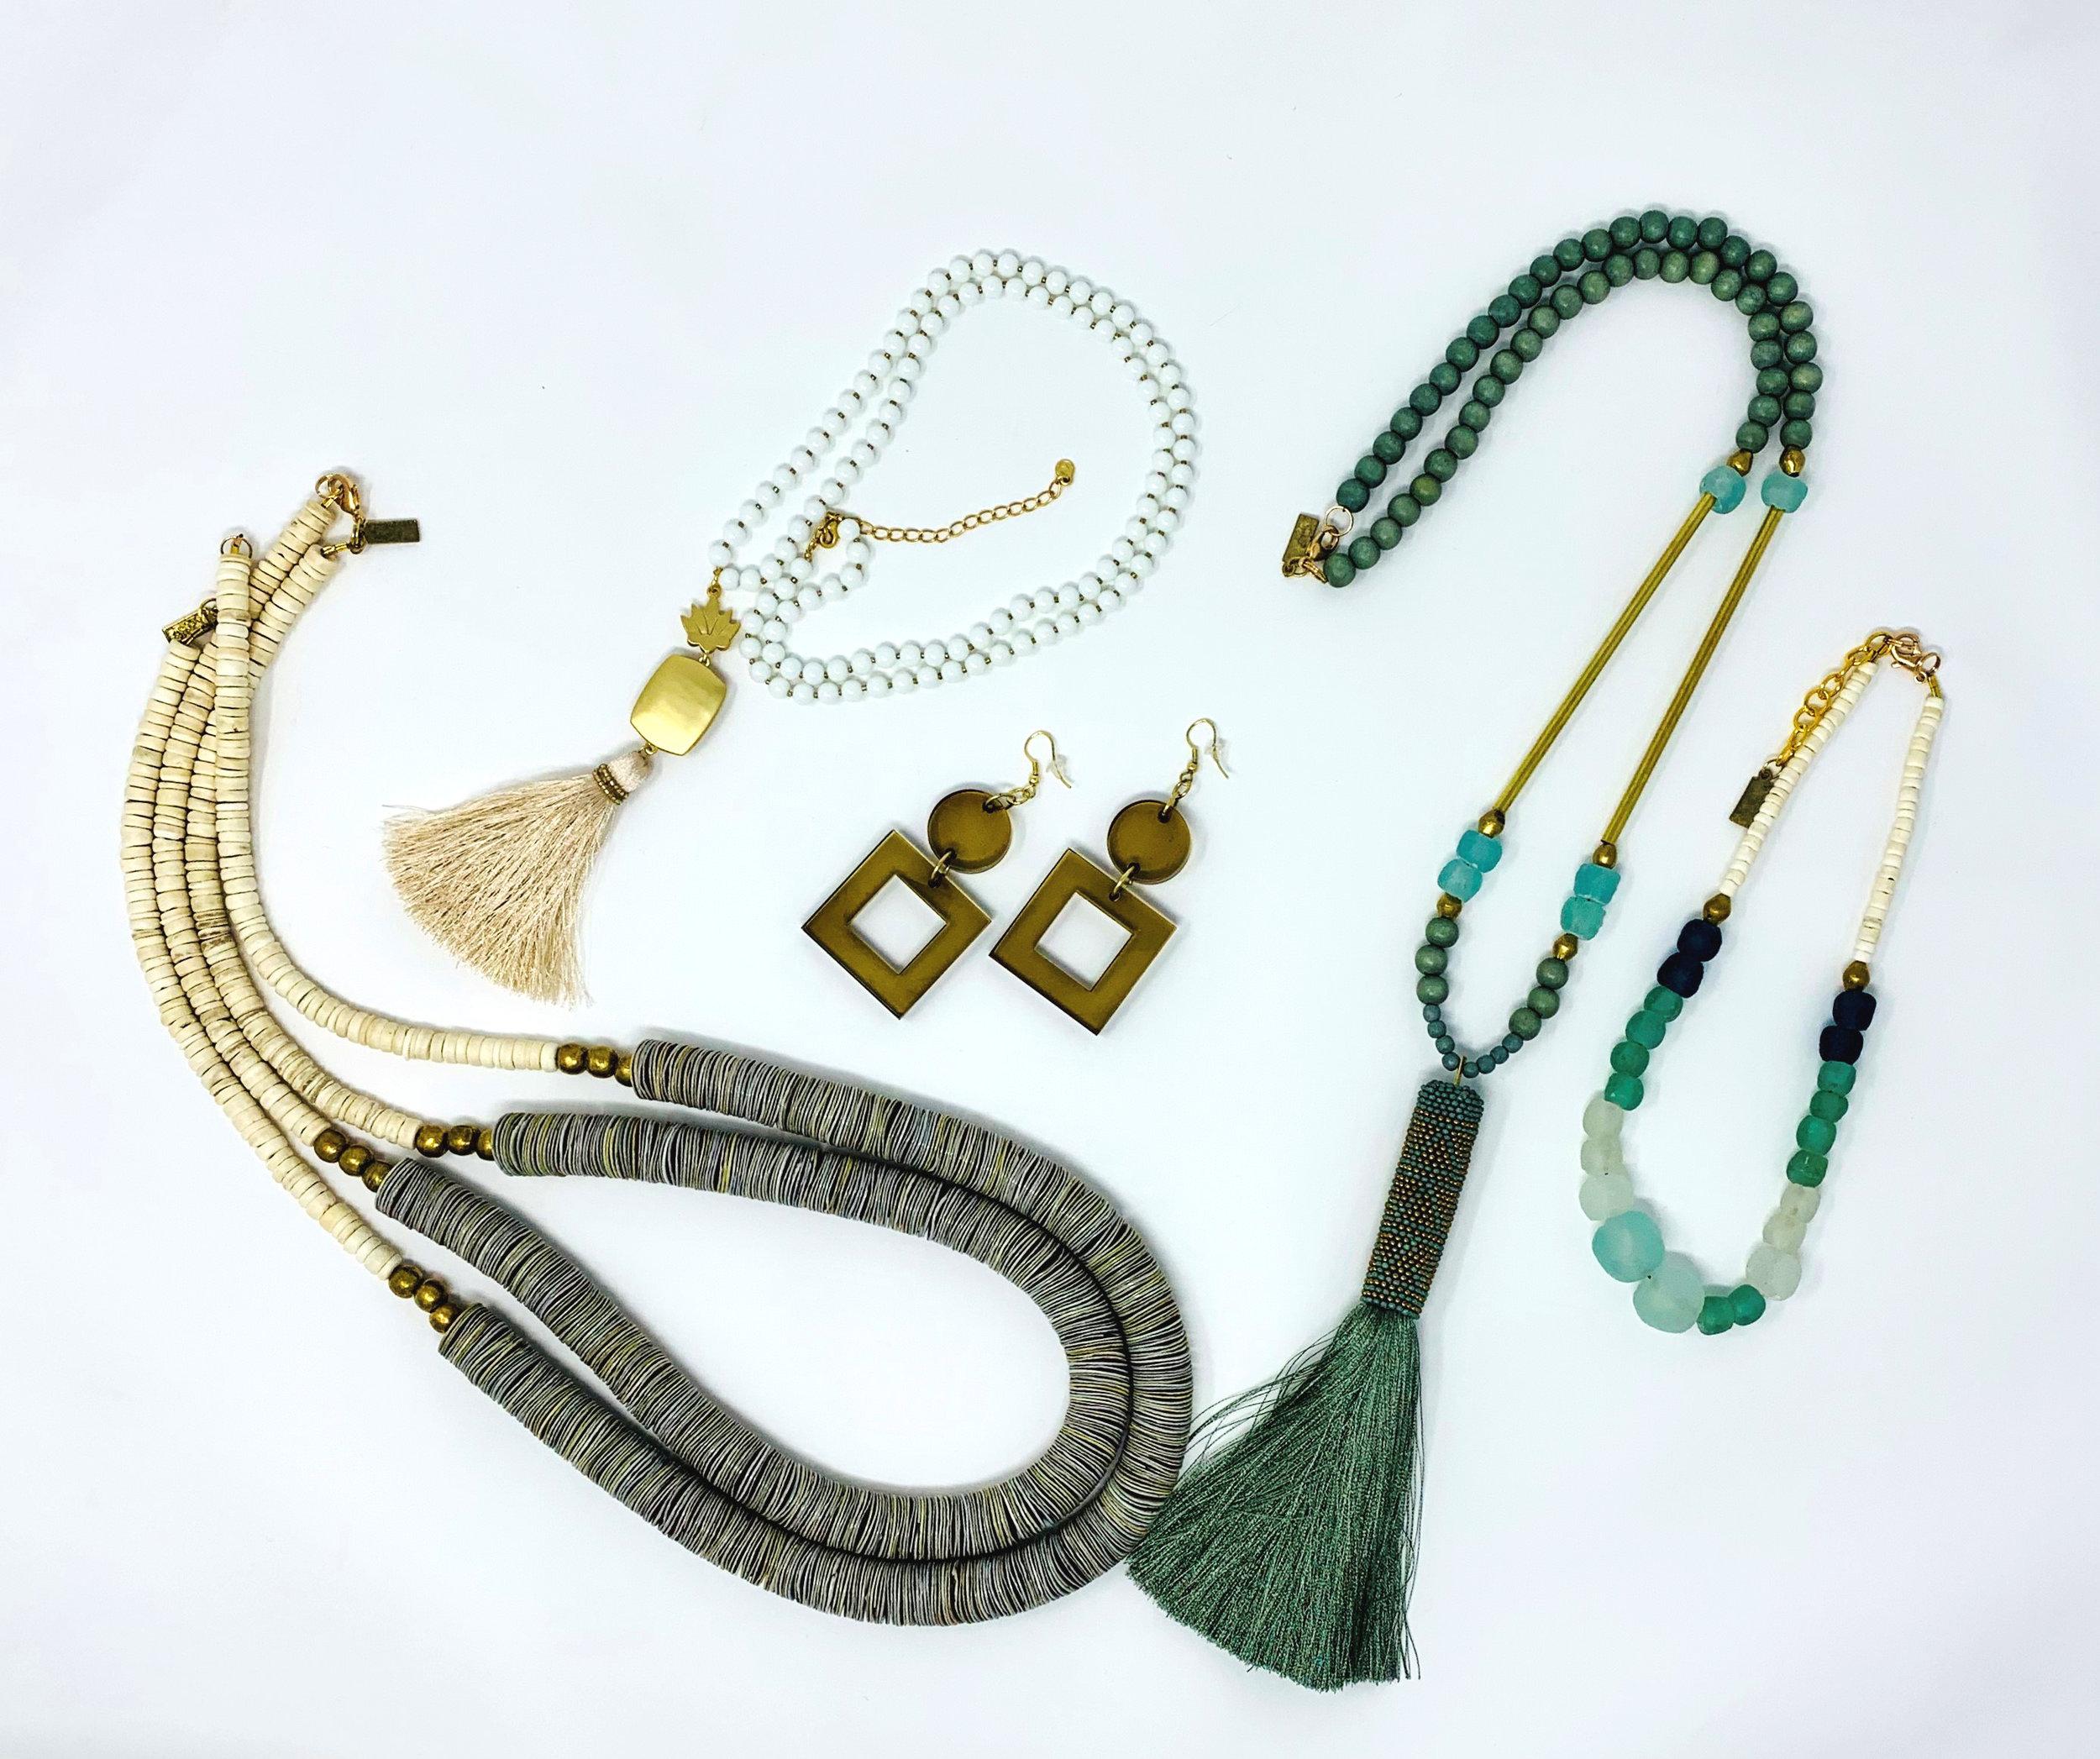 Necklaces at gift shop, Atlanta, GA